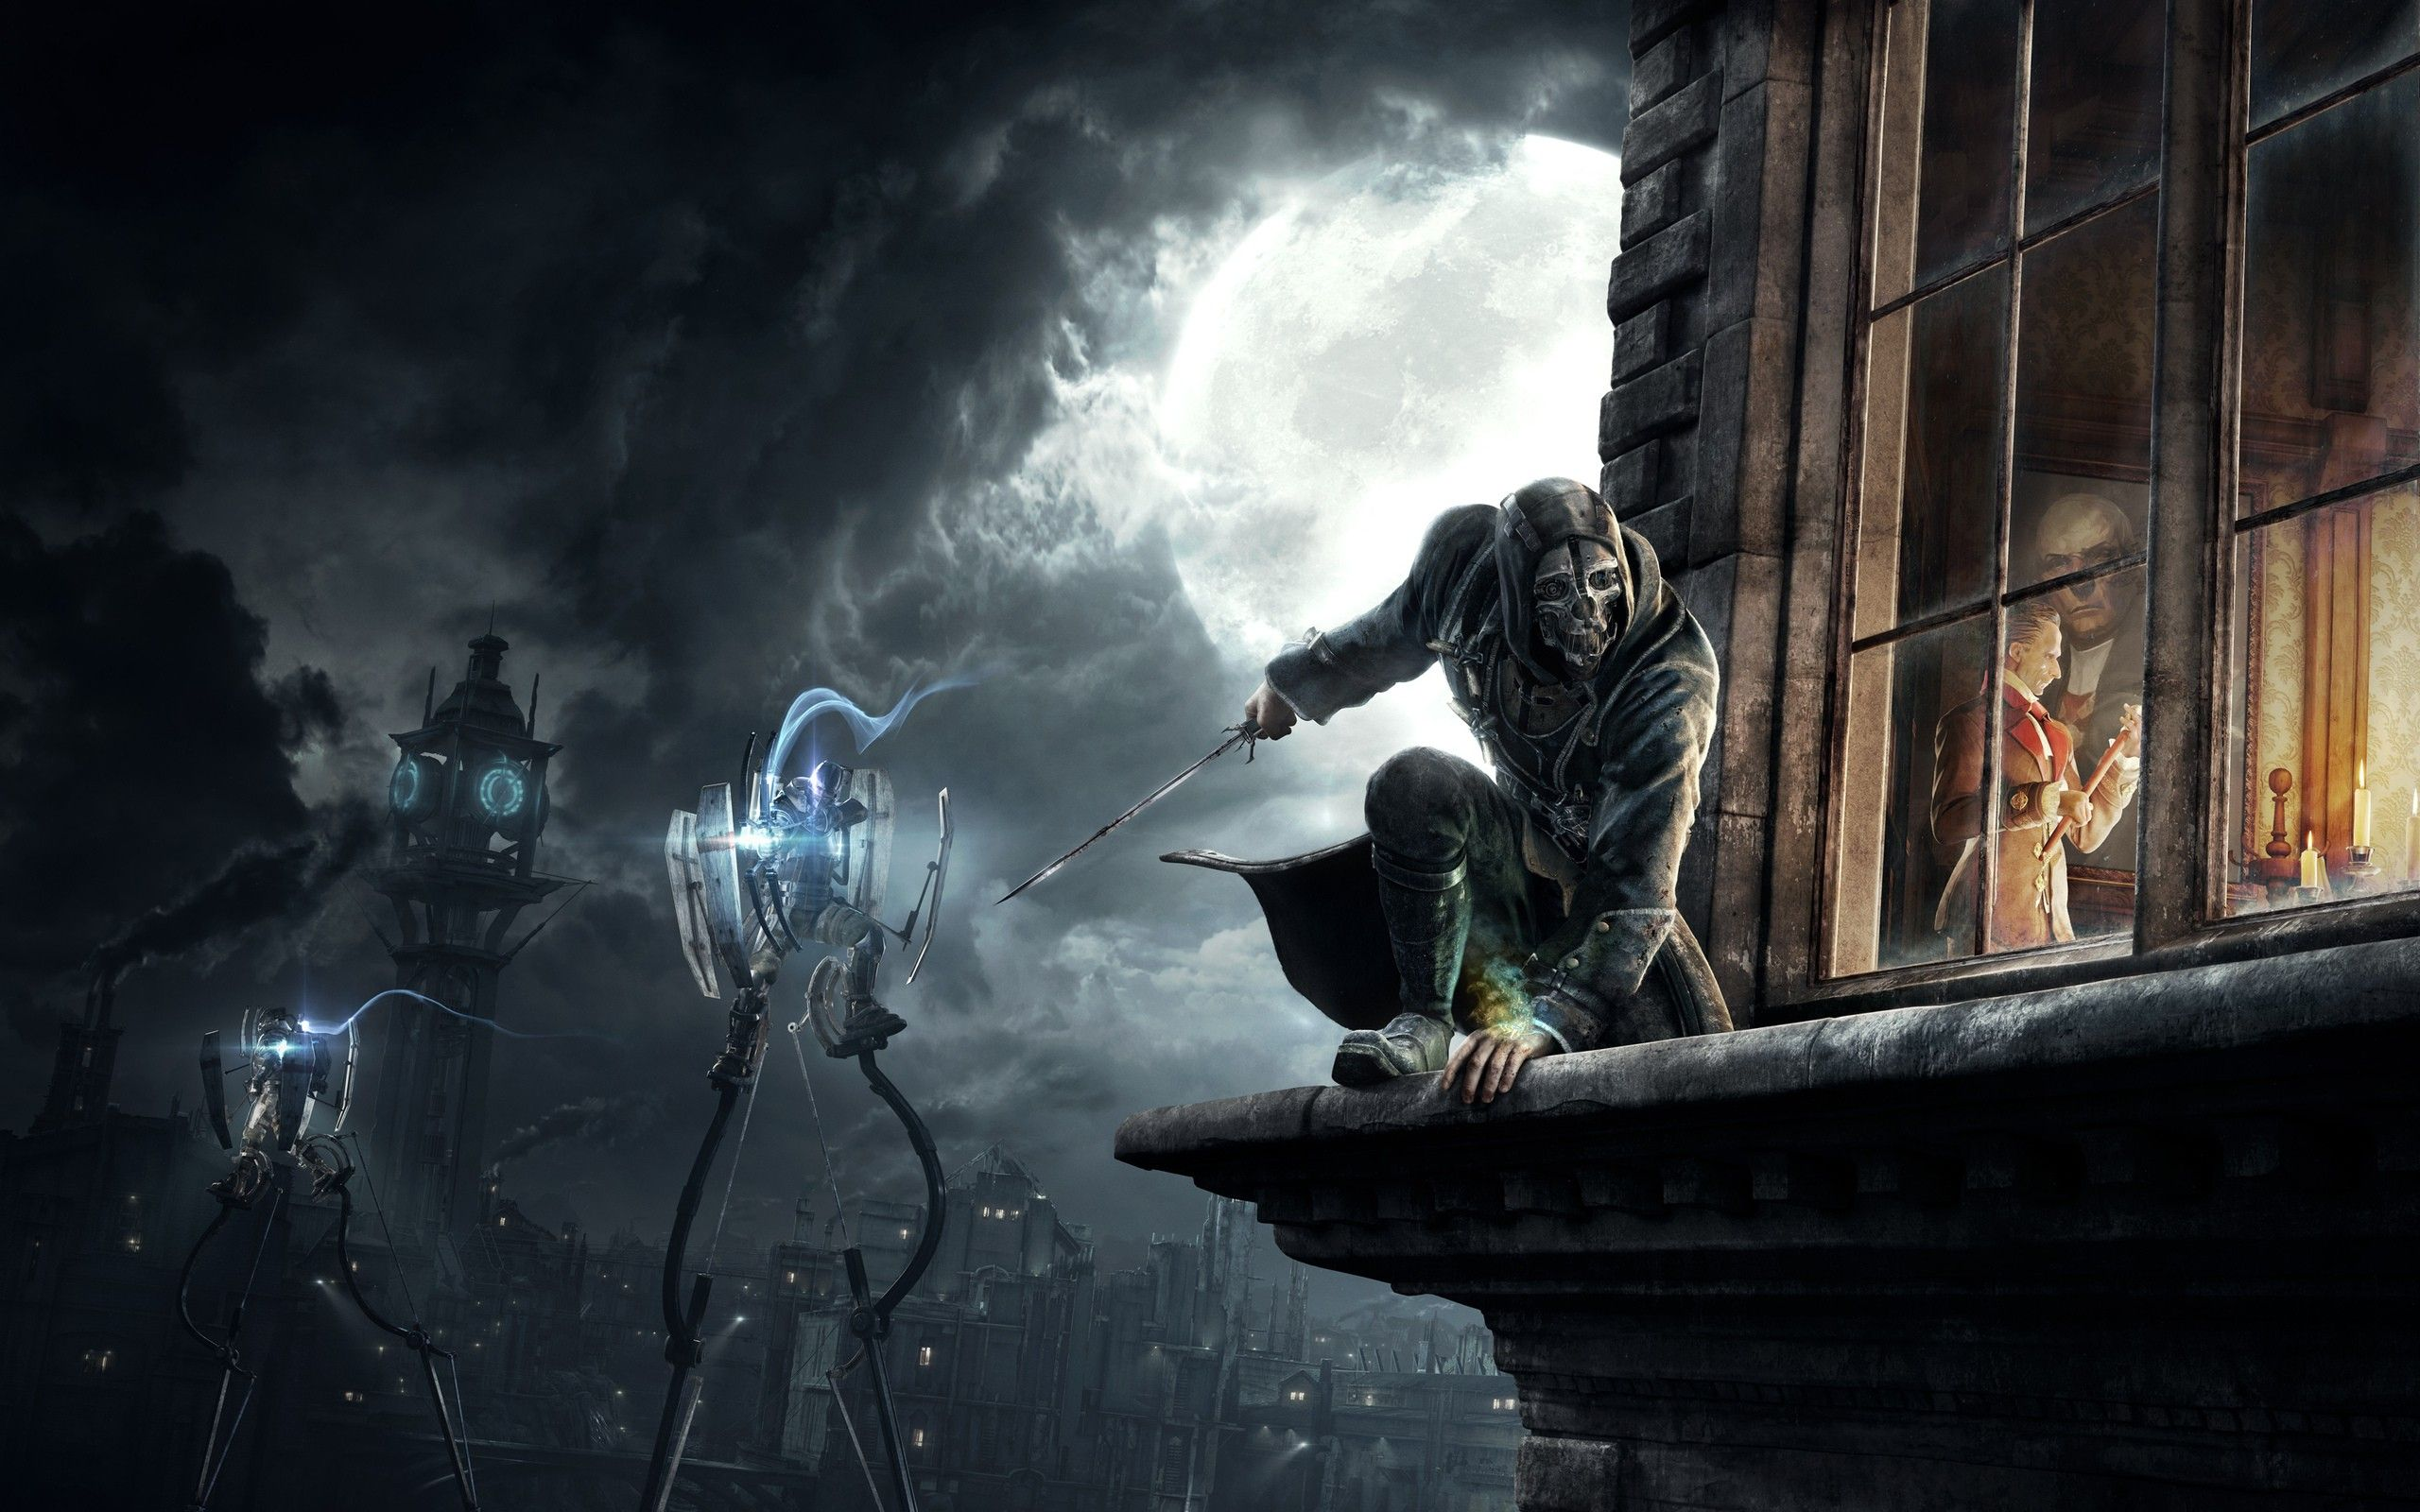 Corvo Attano Digital Art Video Games Dishonored Wallpaper